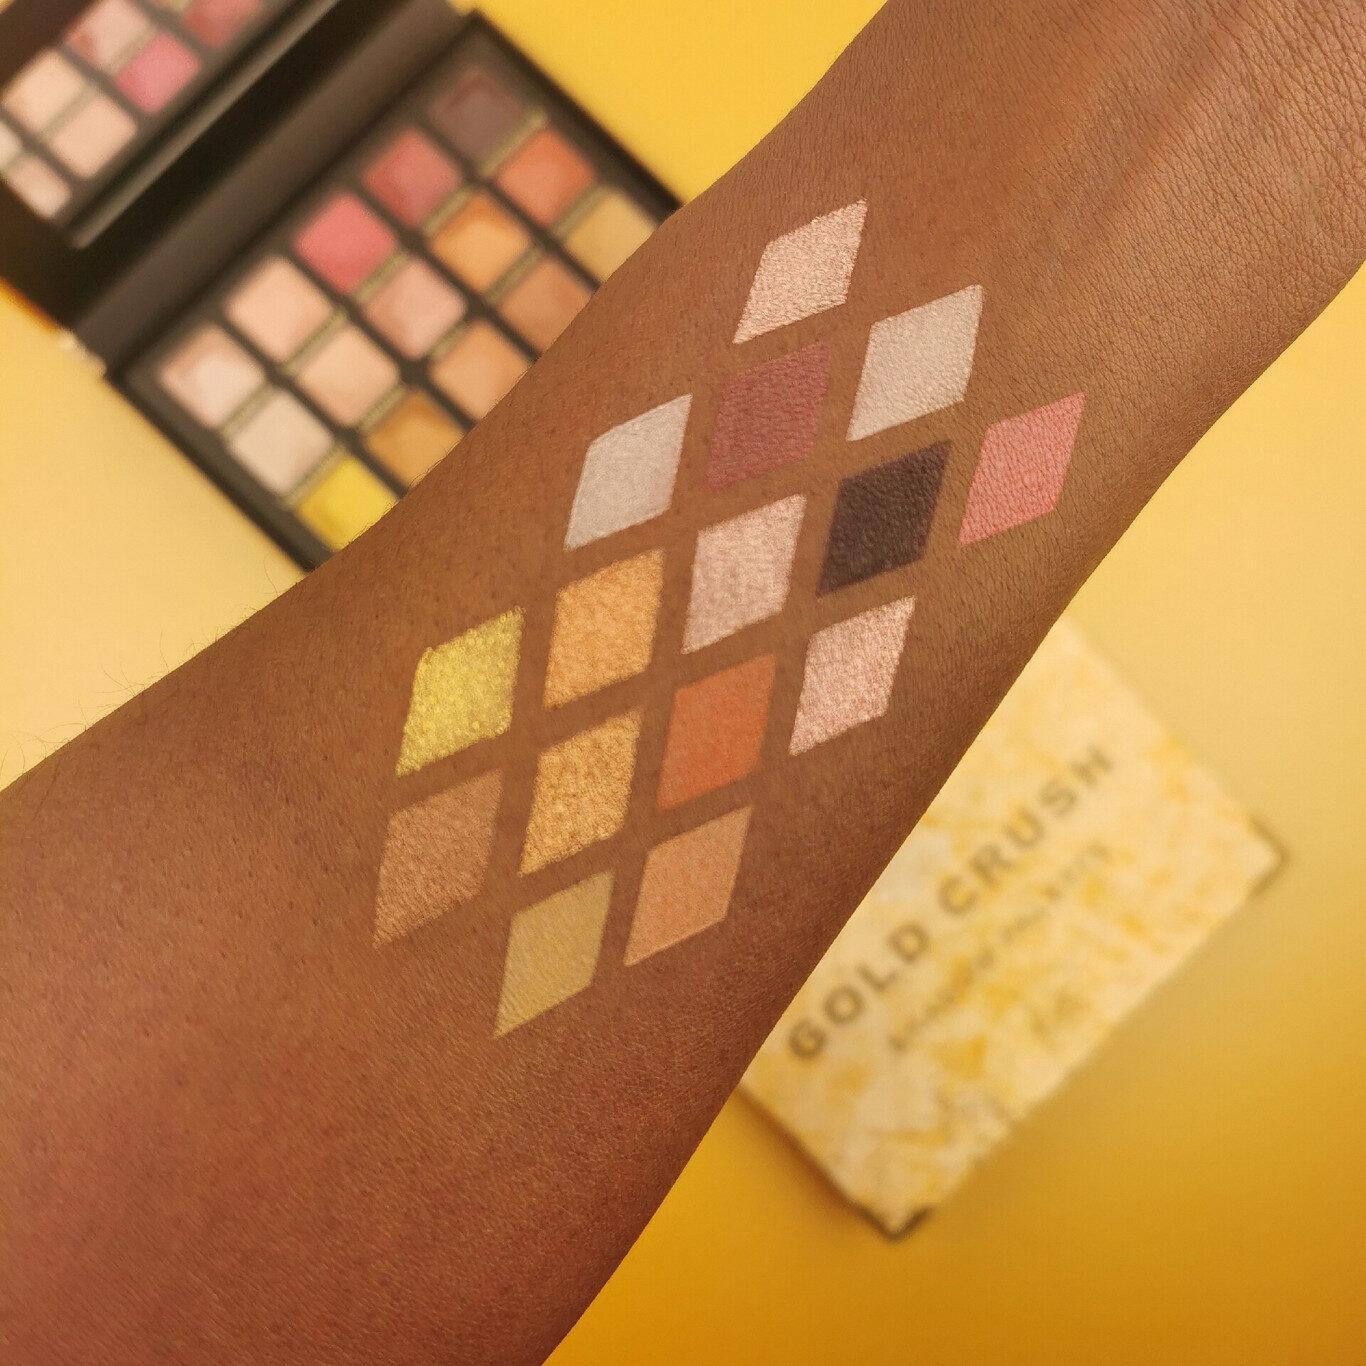 XX Revolution MetaliXX Collection MetaliXX Gold Crush Eyeshadow Palette Arm Swatches